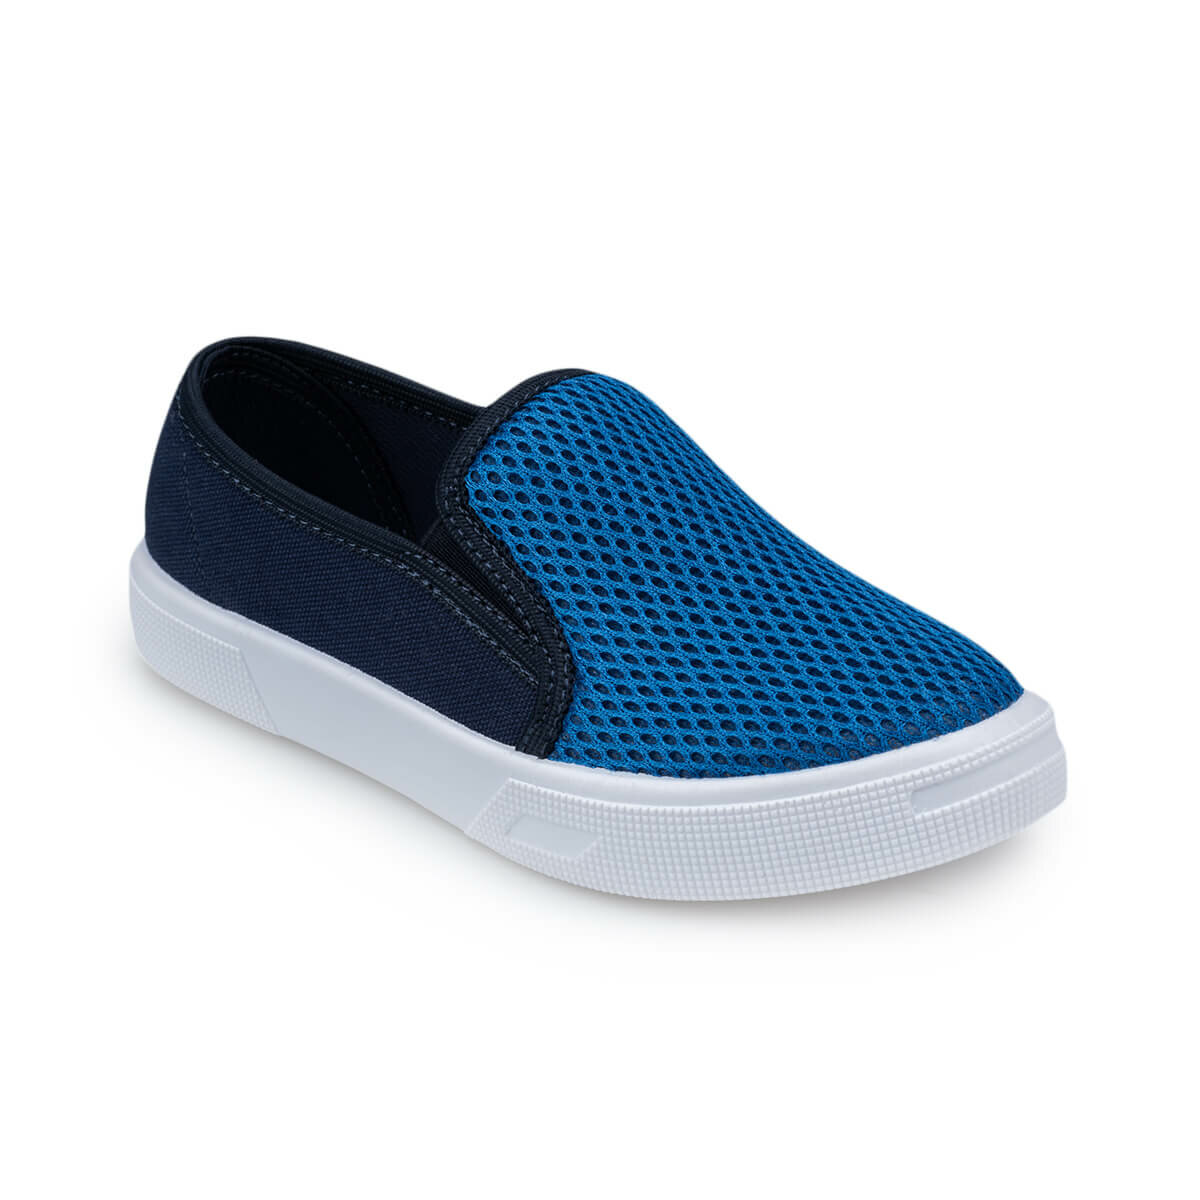 FLO 91.511348.F Blue Male Child Slip On Shoes Polaris